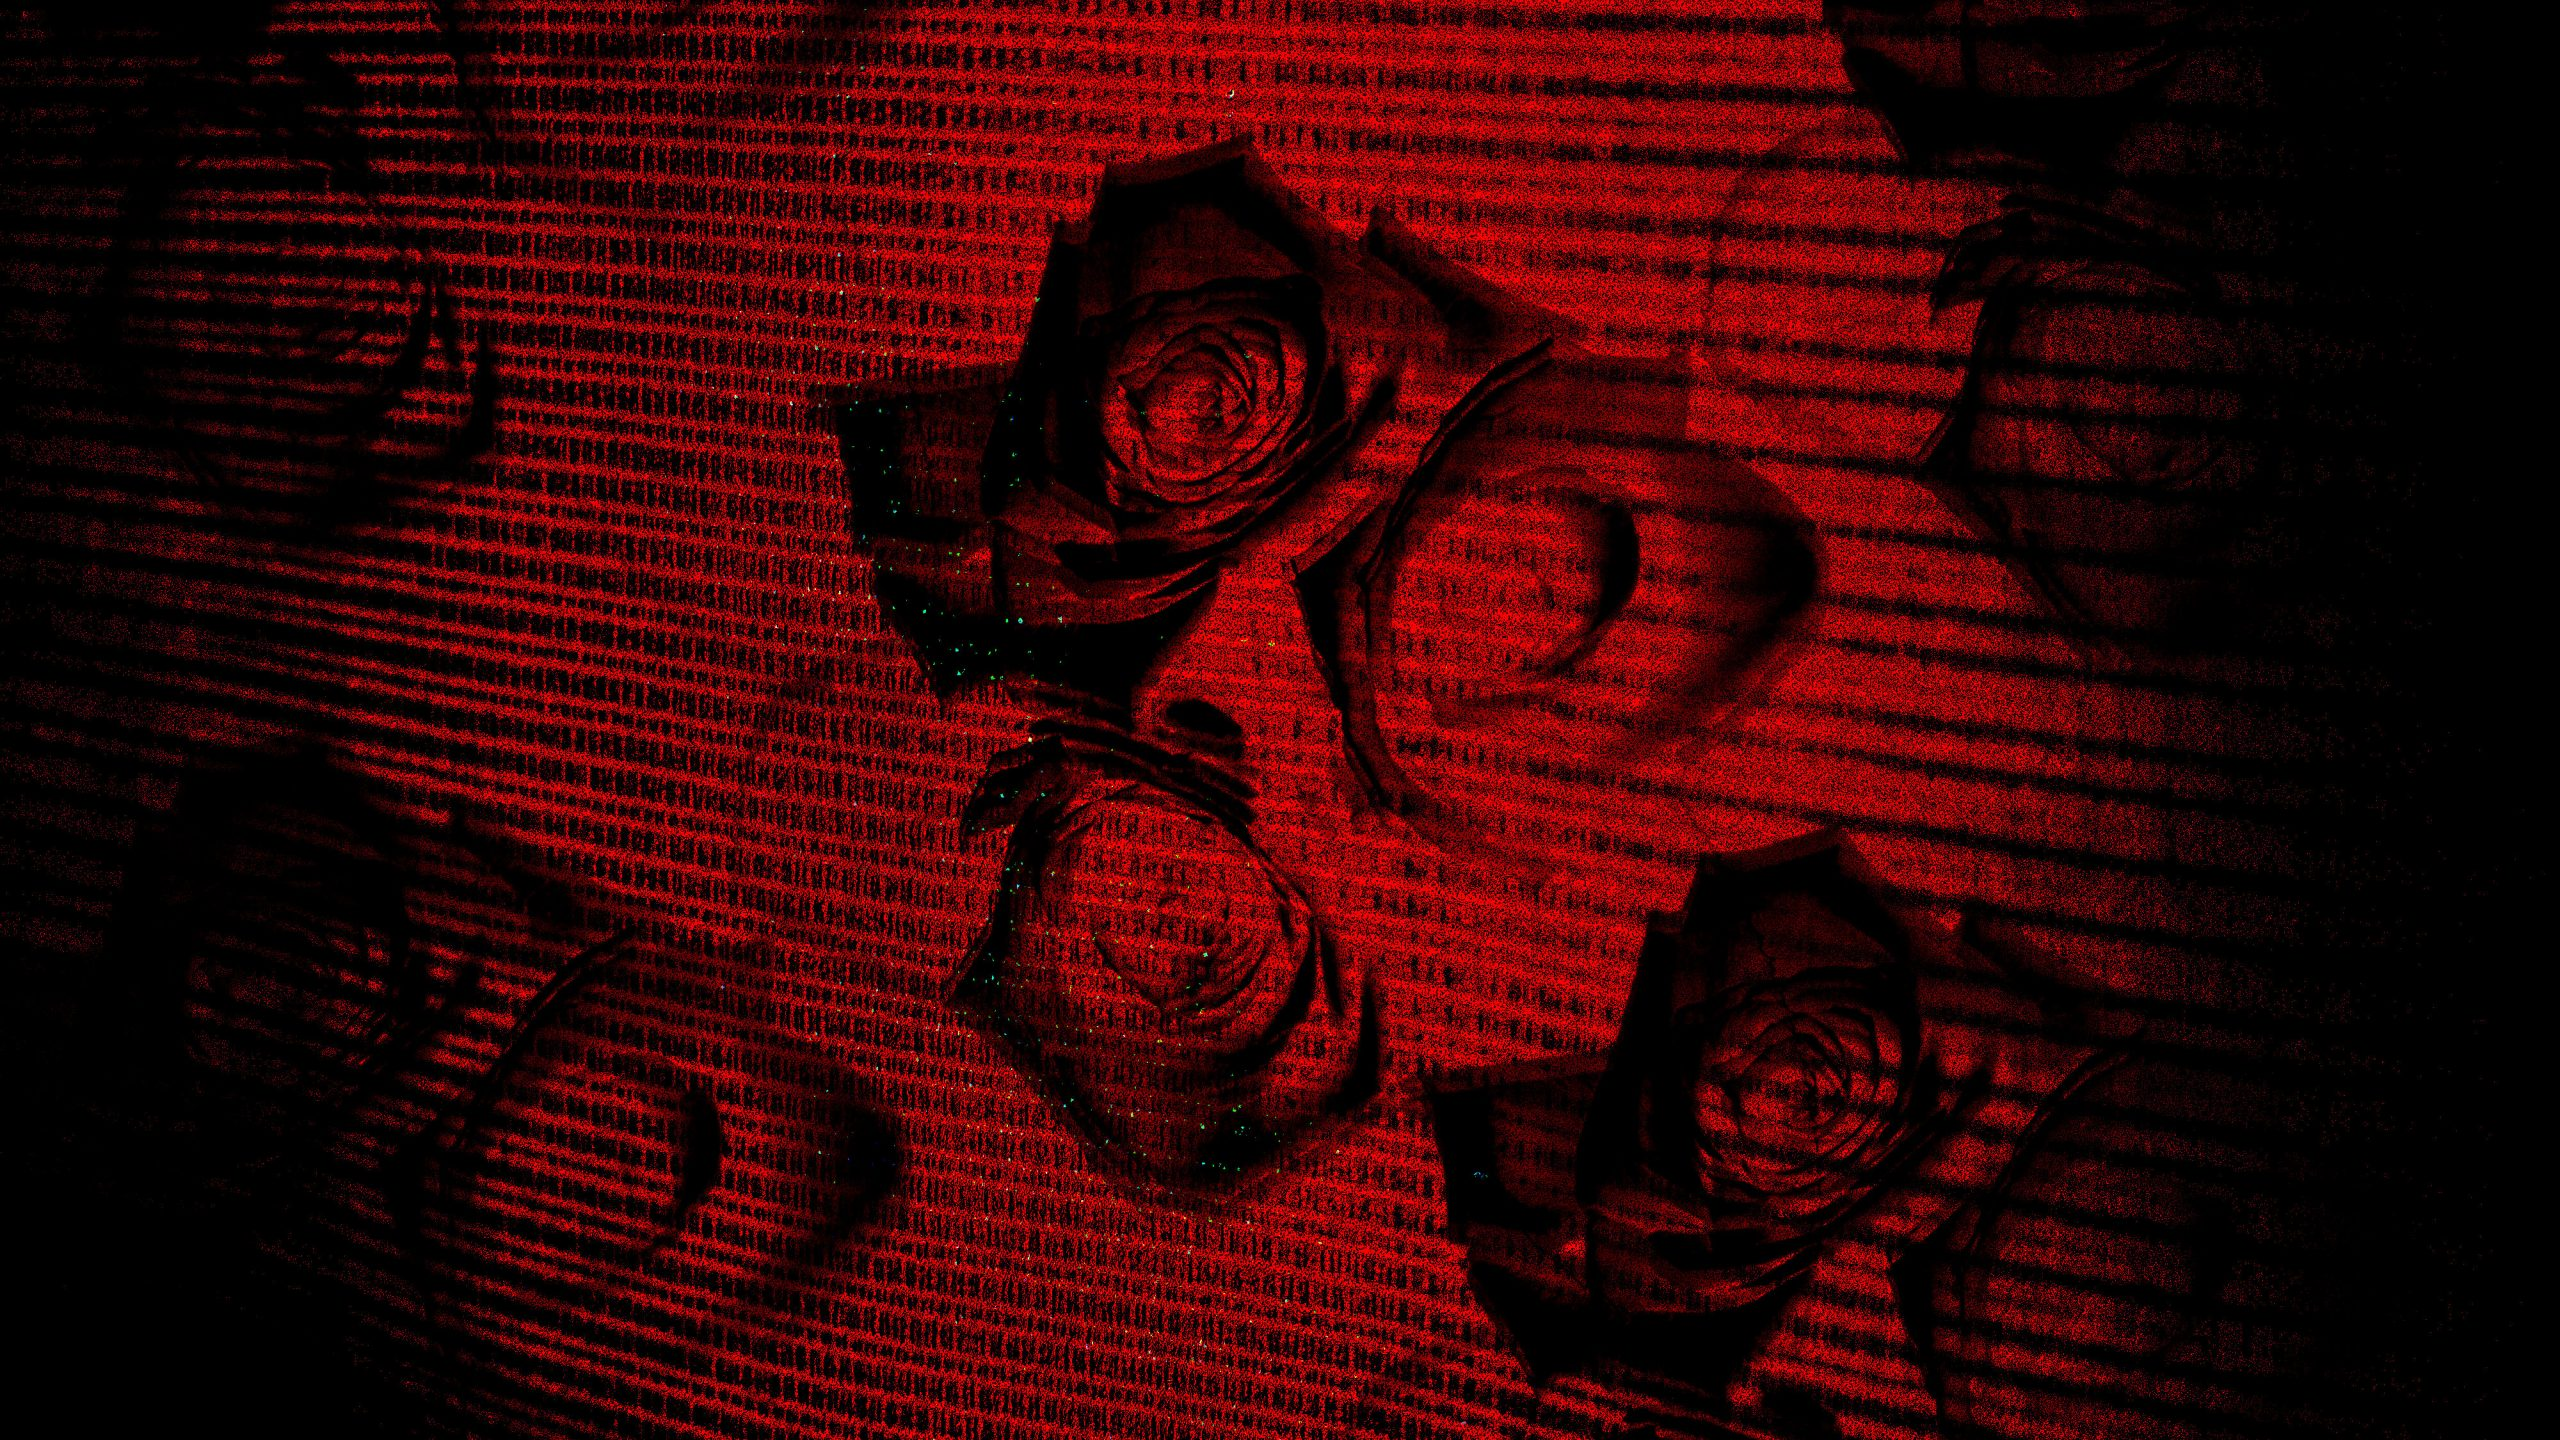 Rose background wallpaper